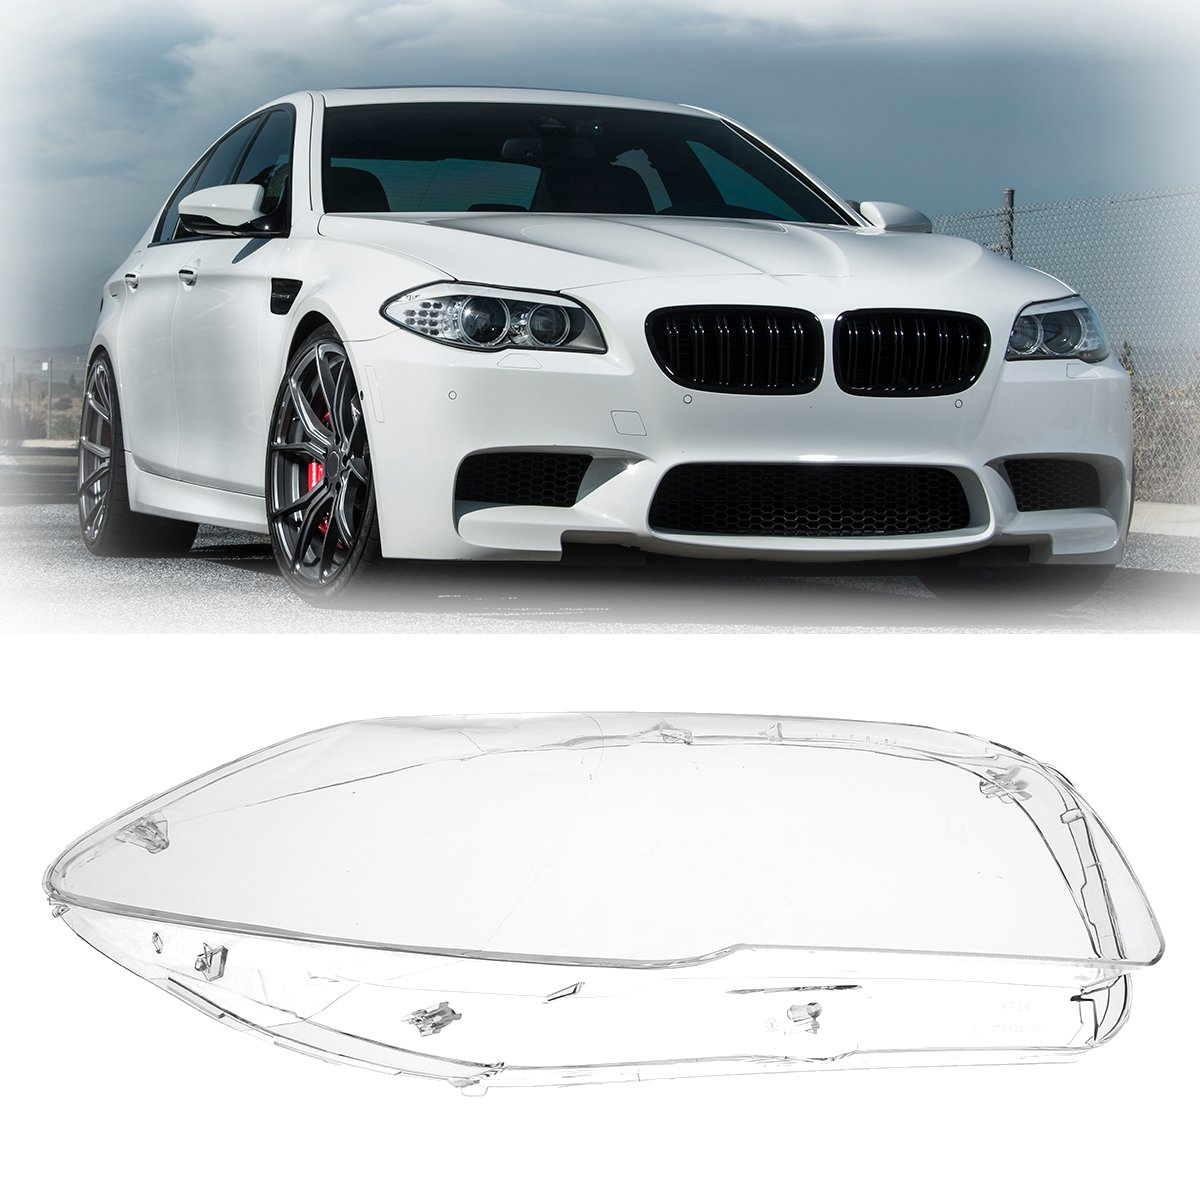 Car Headlight Clear Lens Cover Headlamp Shell  Right /Left Side For BMW 5 F10 F18 520 523 525 535 530 2010-2014Car Headlight Clear Lens Cover Headlamp Shell  Right /Left Side For BMW 5 F10 F18 520 523 525 535 530 2010-2014